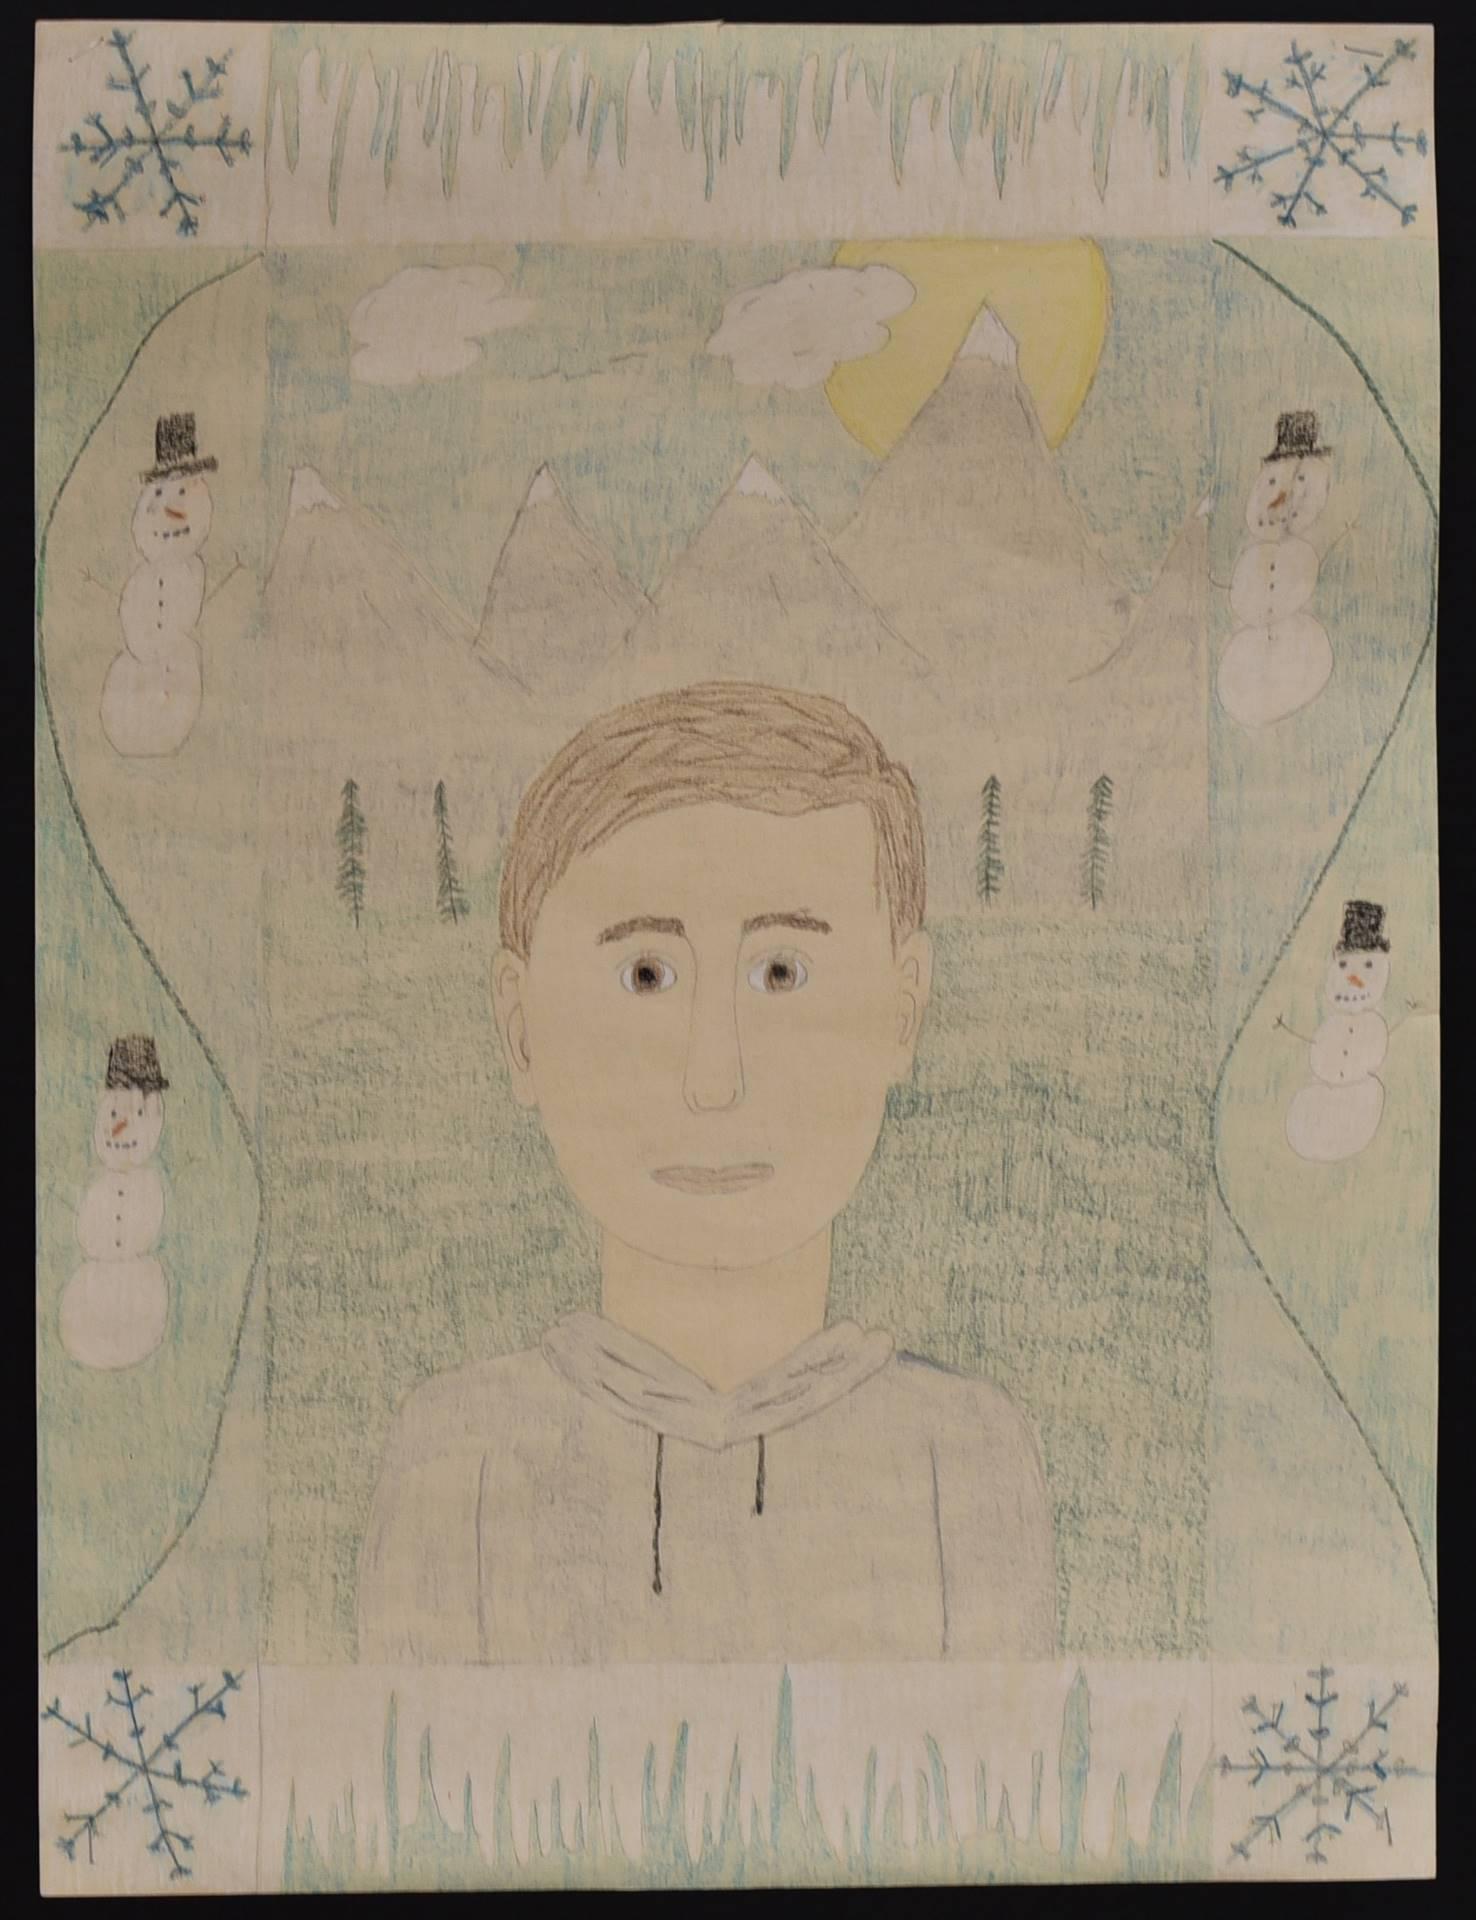 Brecksville-Broadview Hts. Middle School Art Projects 154